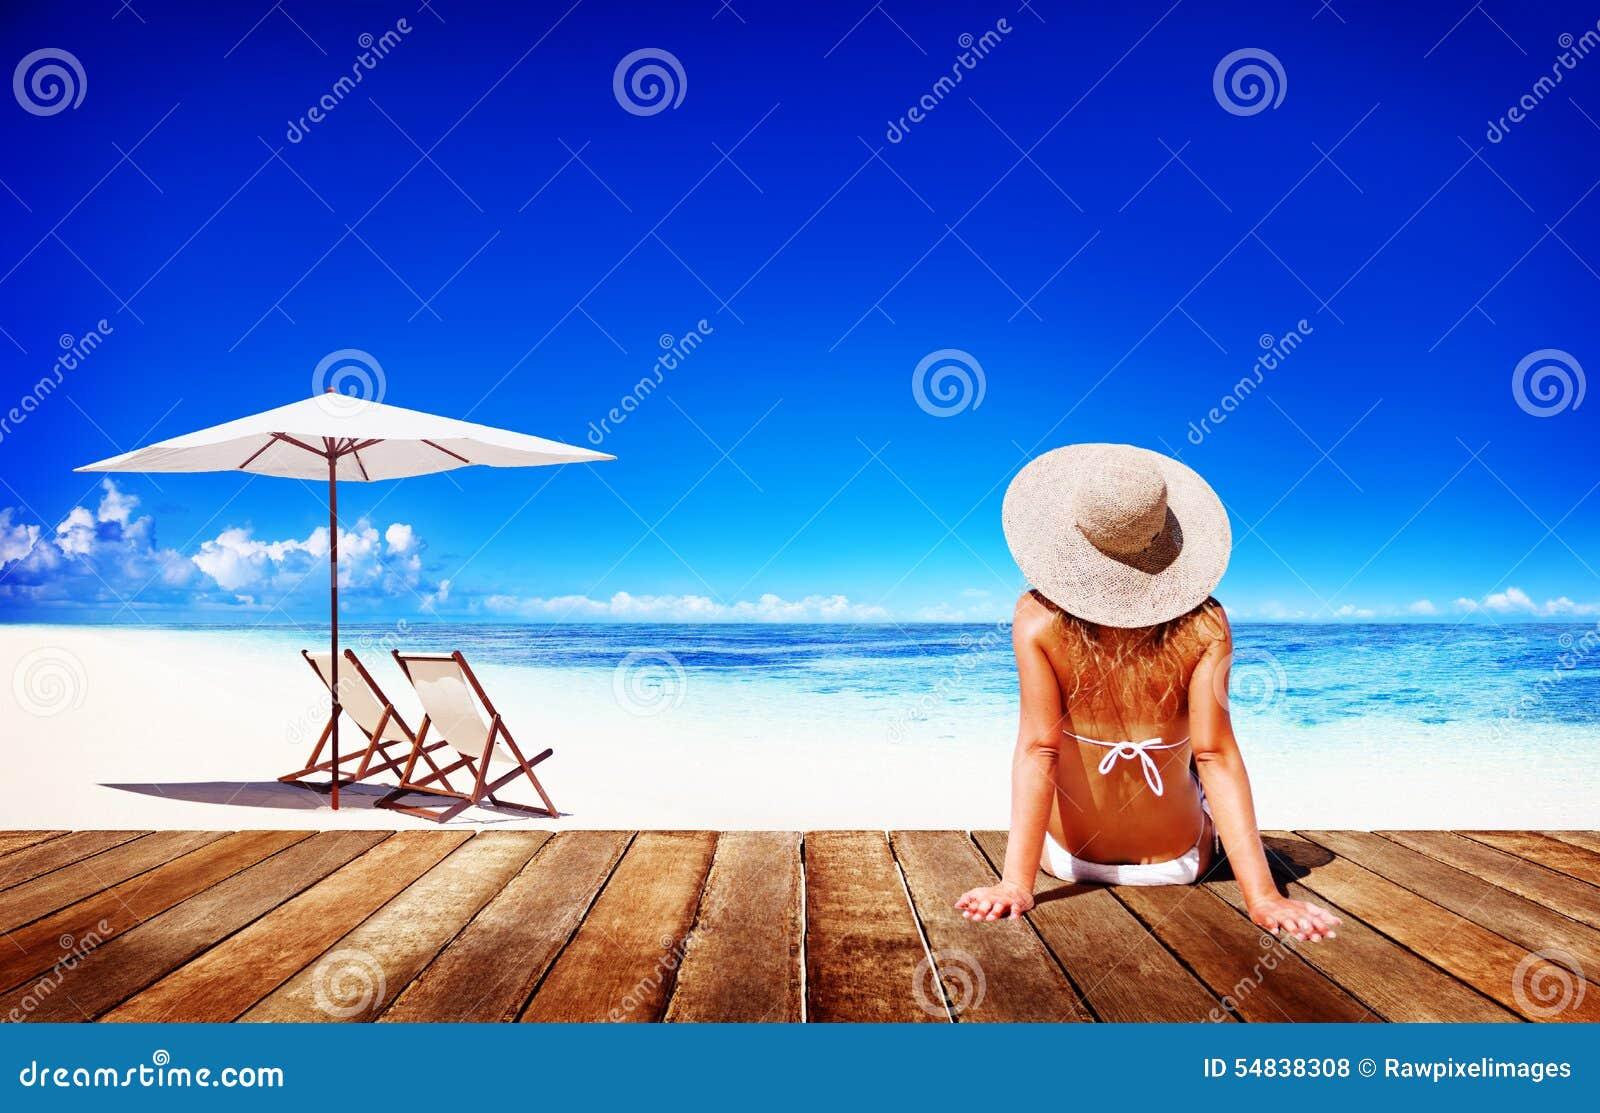 La mujer toma el sol a Sunny Summer Beach Relaxing Concept